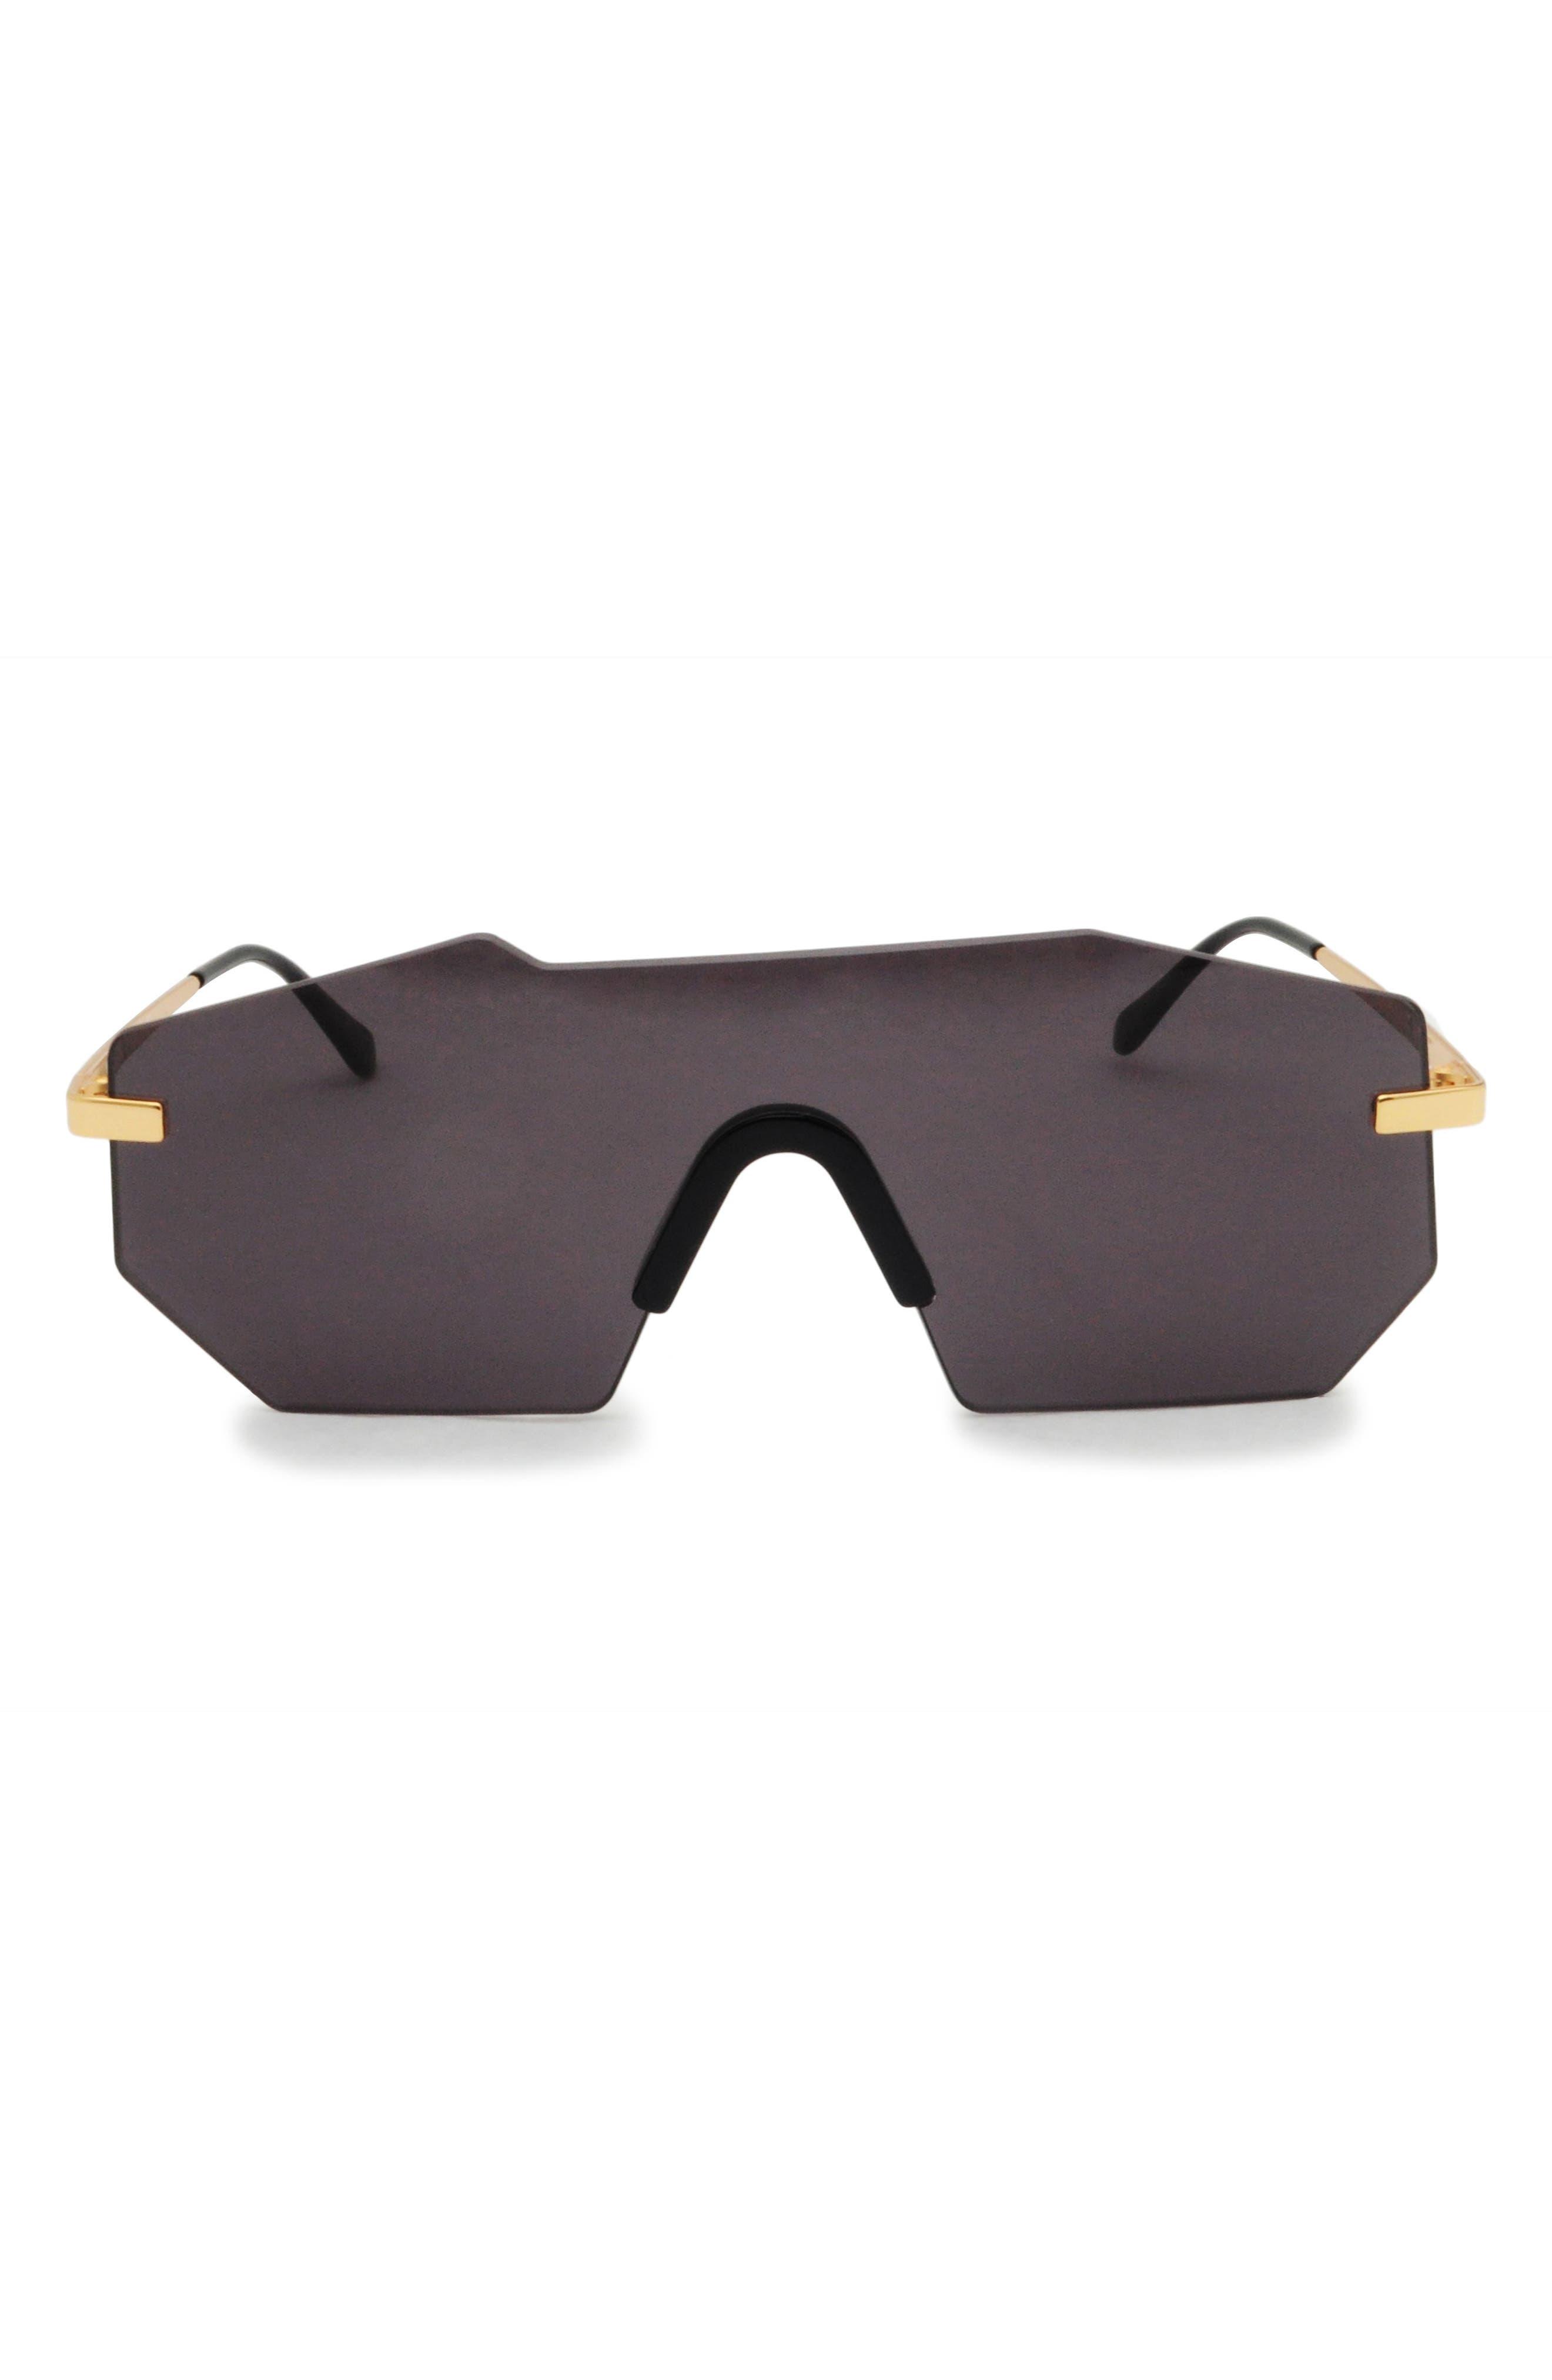 Main Image - GLASSING GP1 132mm Shield Sunglasses